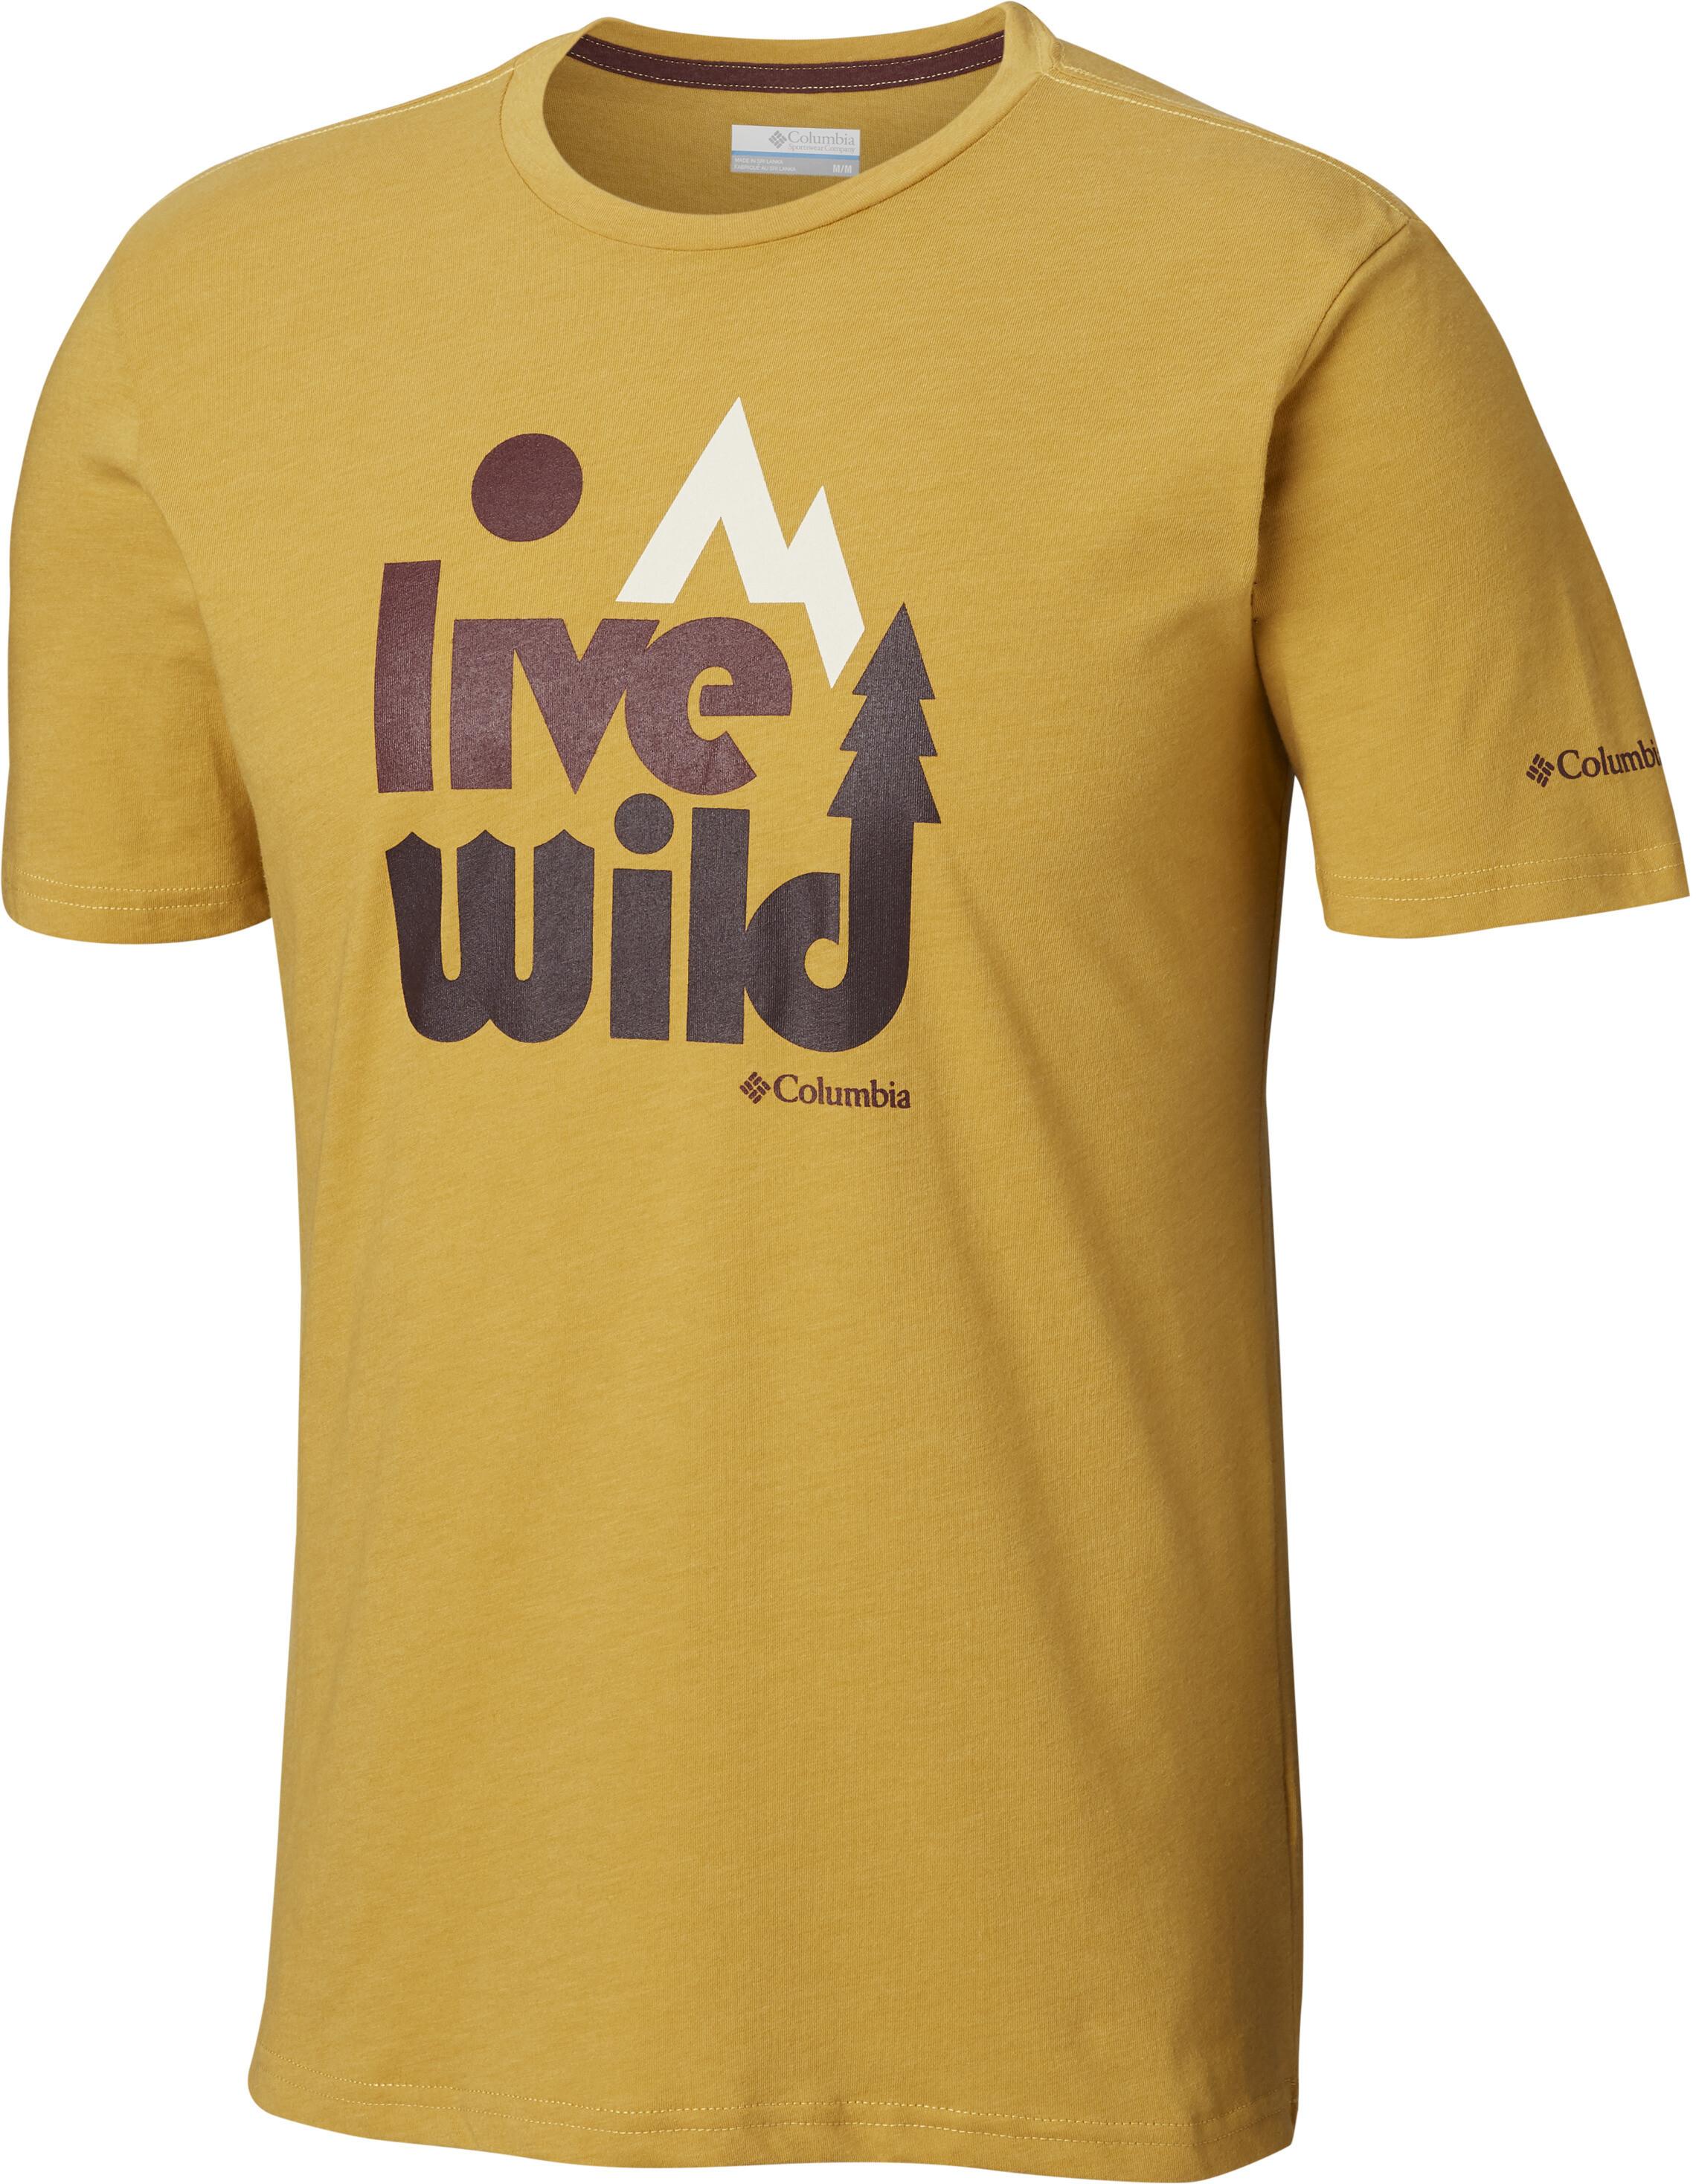 1b0ed54f70b9e Columbia Terra Vale - Camiseta manga corta Hombre - amarillo